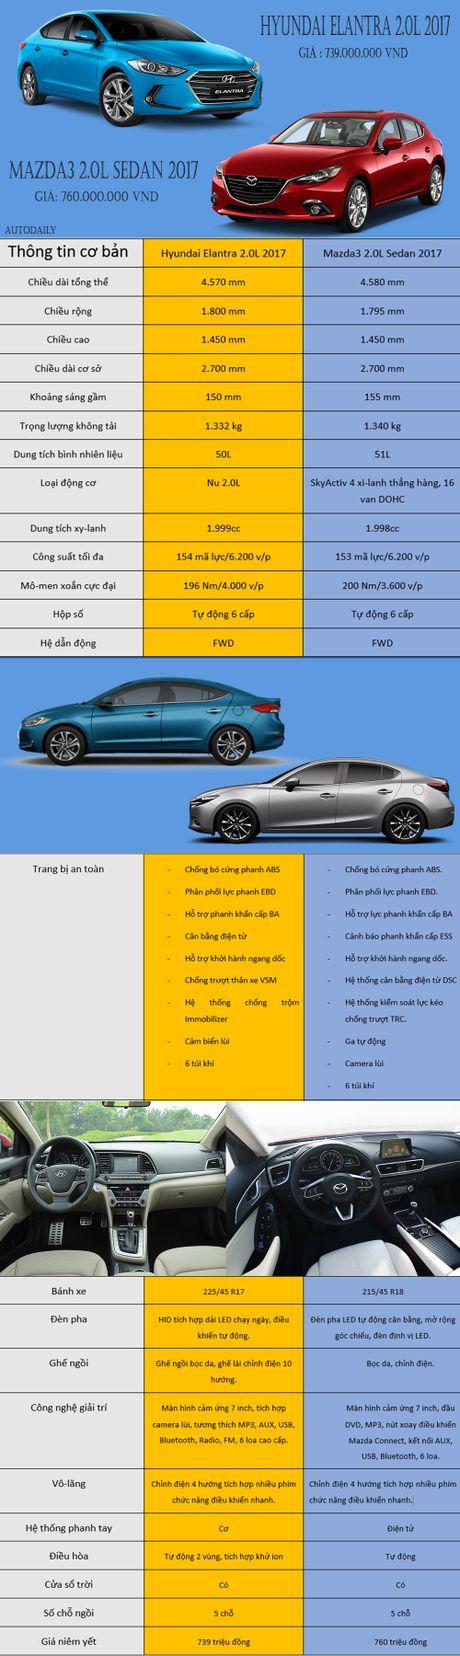 Chon Hyundai Elantra 2.0L 2017 hay Mazda3 2.0L Sedan 2017? - Anh 1